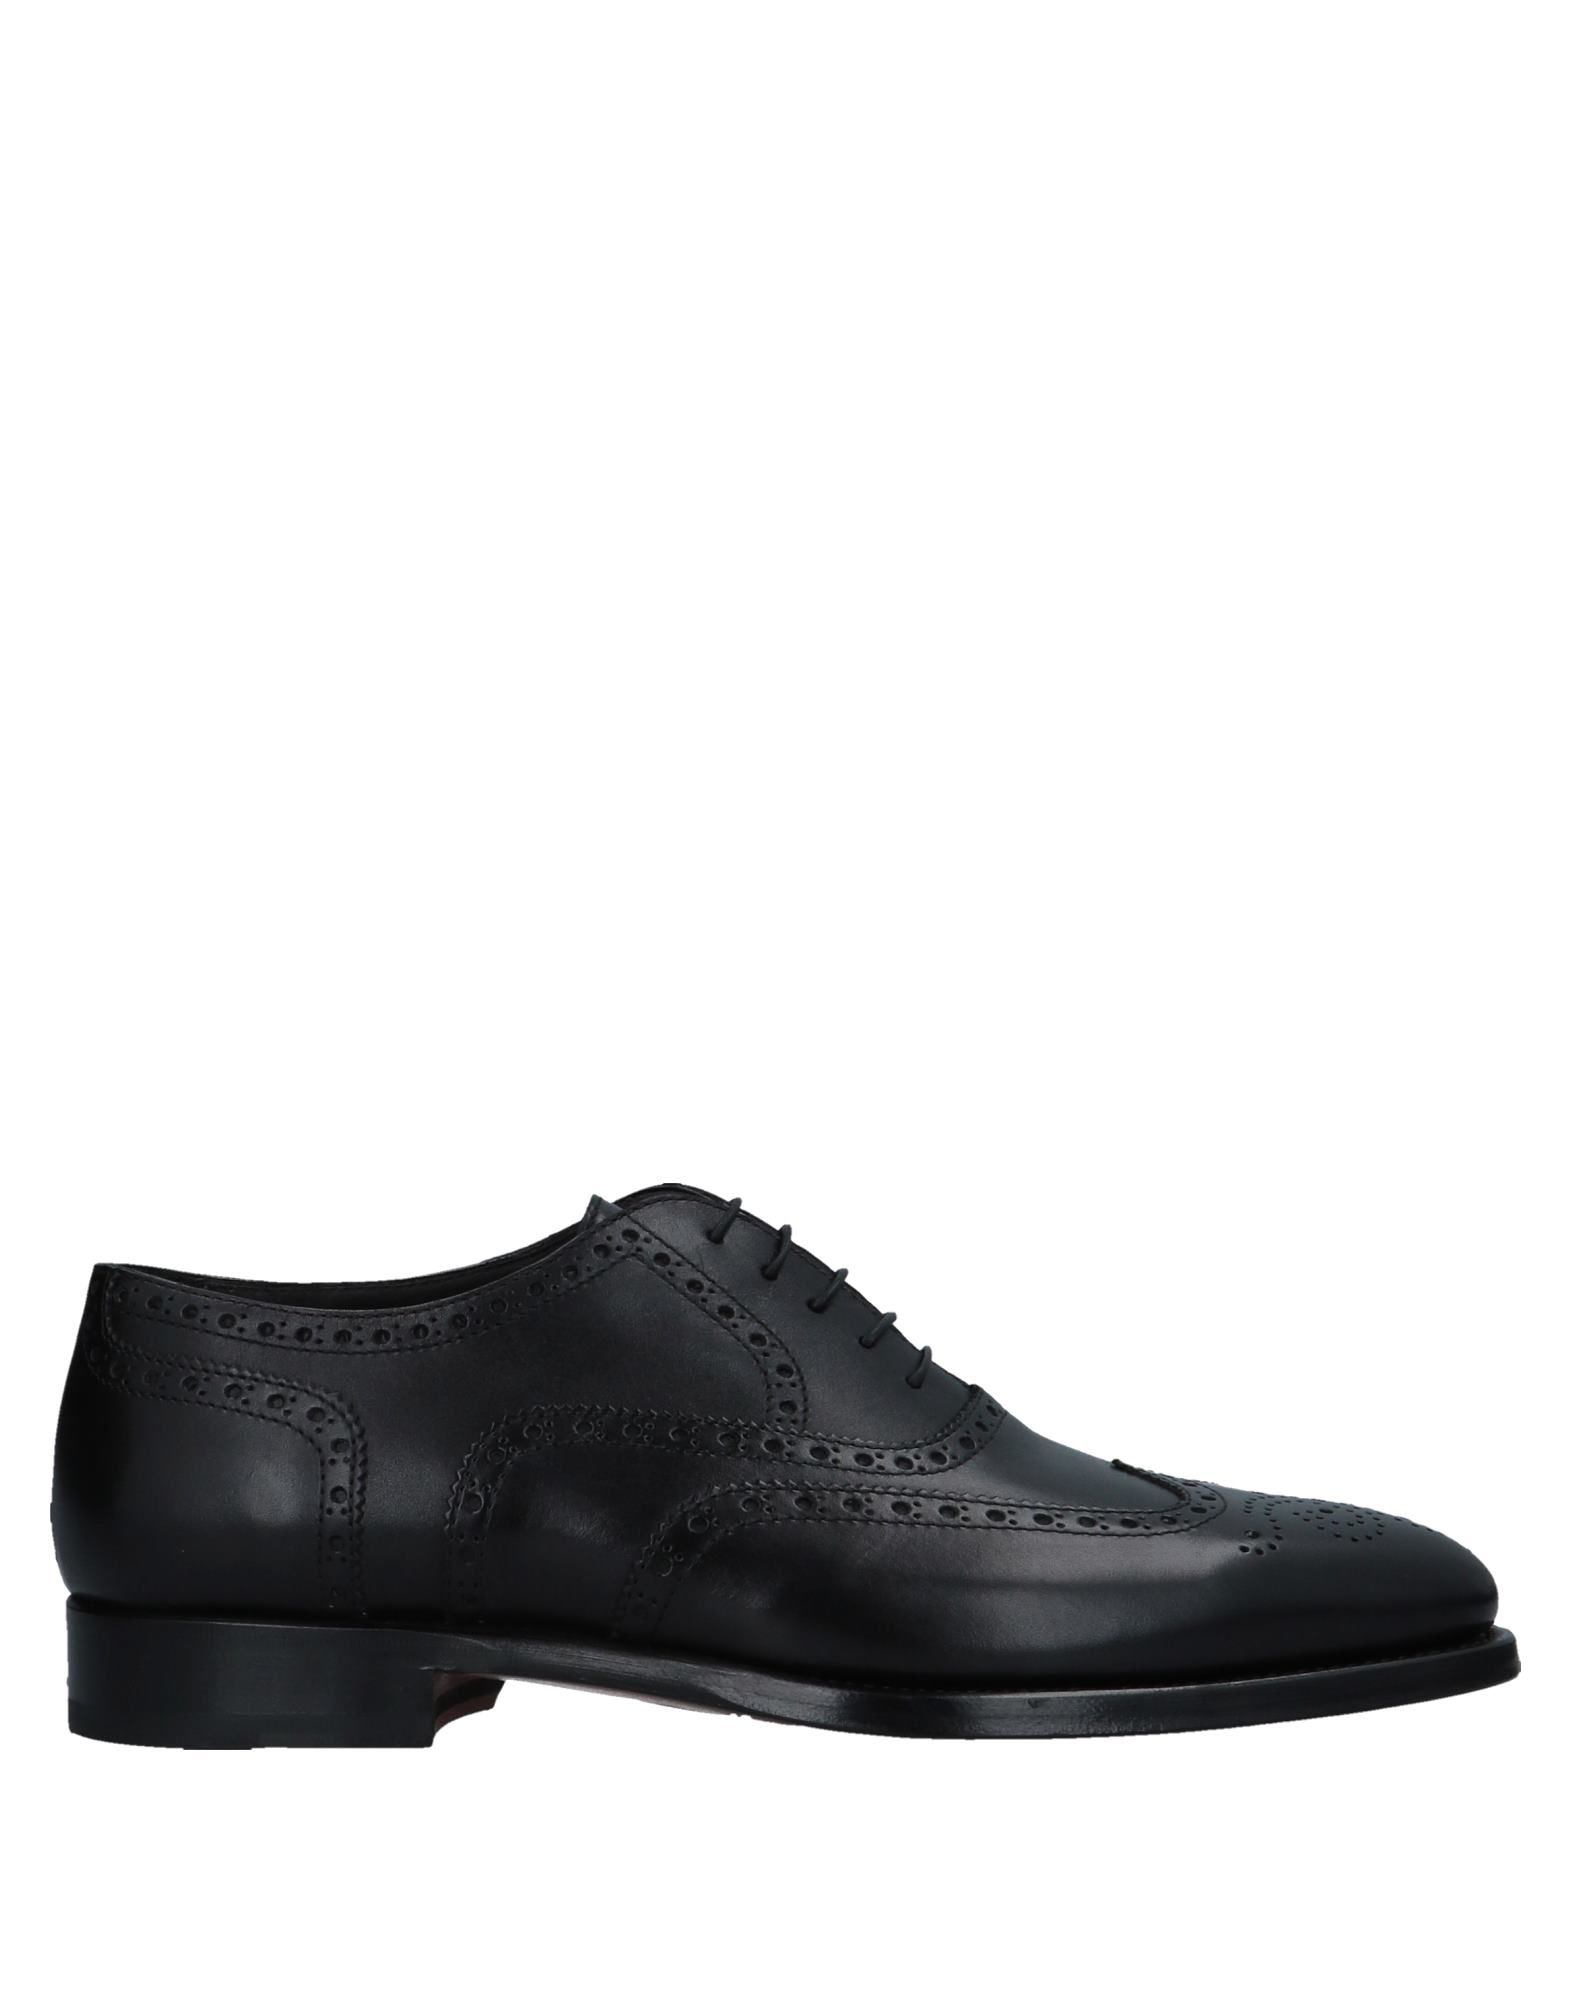 Pellettieri Di  Parma Schnürschuhe Herren  11539529NF Gute Qualität beliebte Schuhe